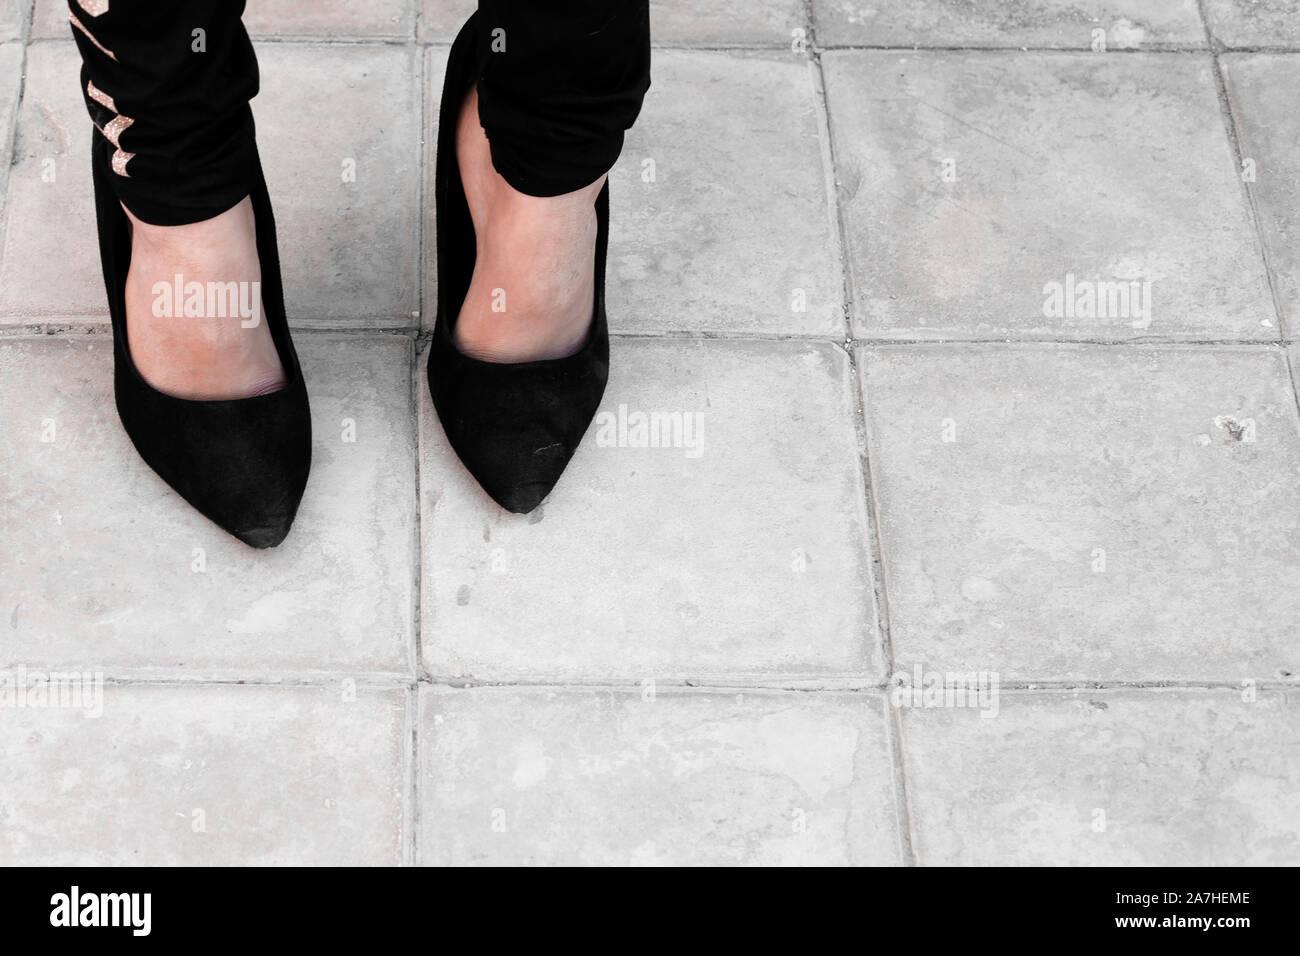 Große Schwarze Schuhe Stockfotos & Große Schwarze Schuhe